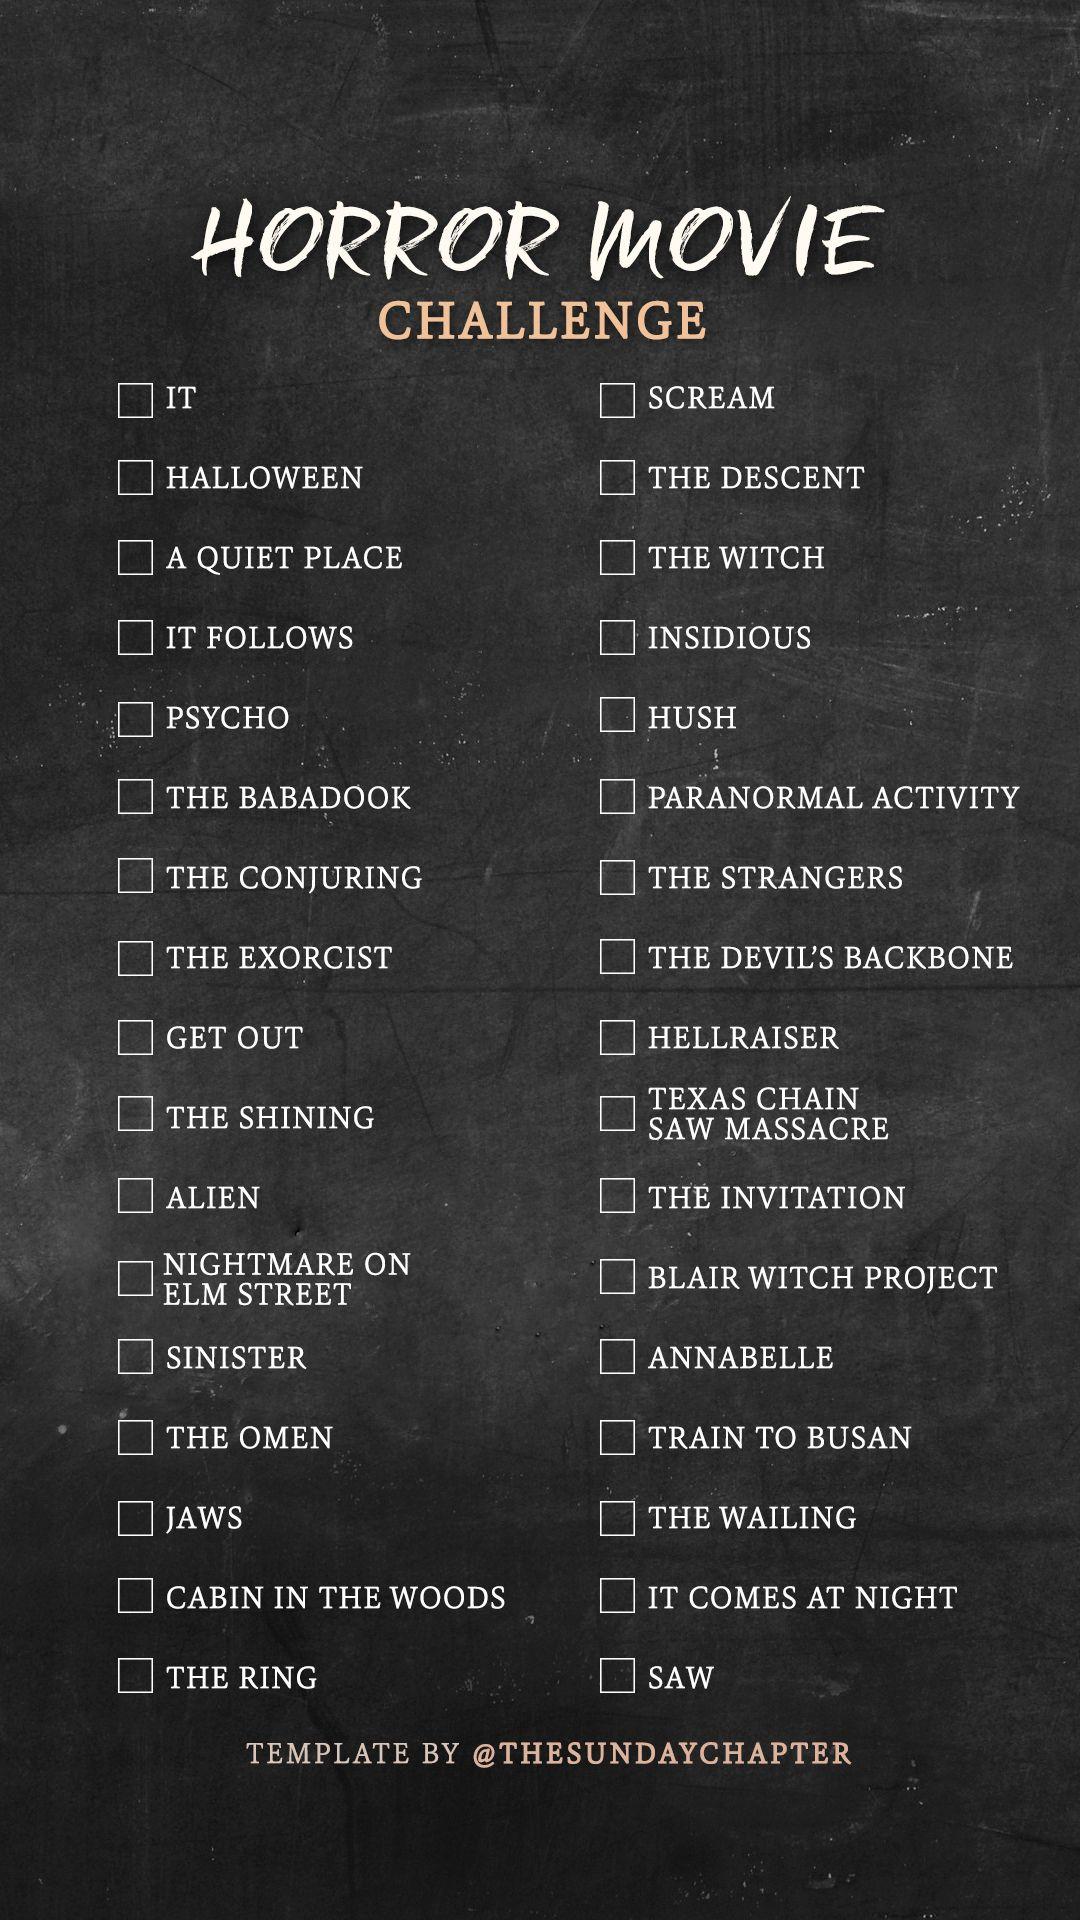 Horror movie instagram story template | Templates | Pinterest ...